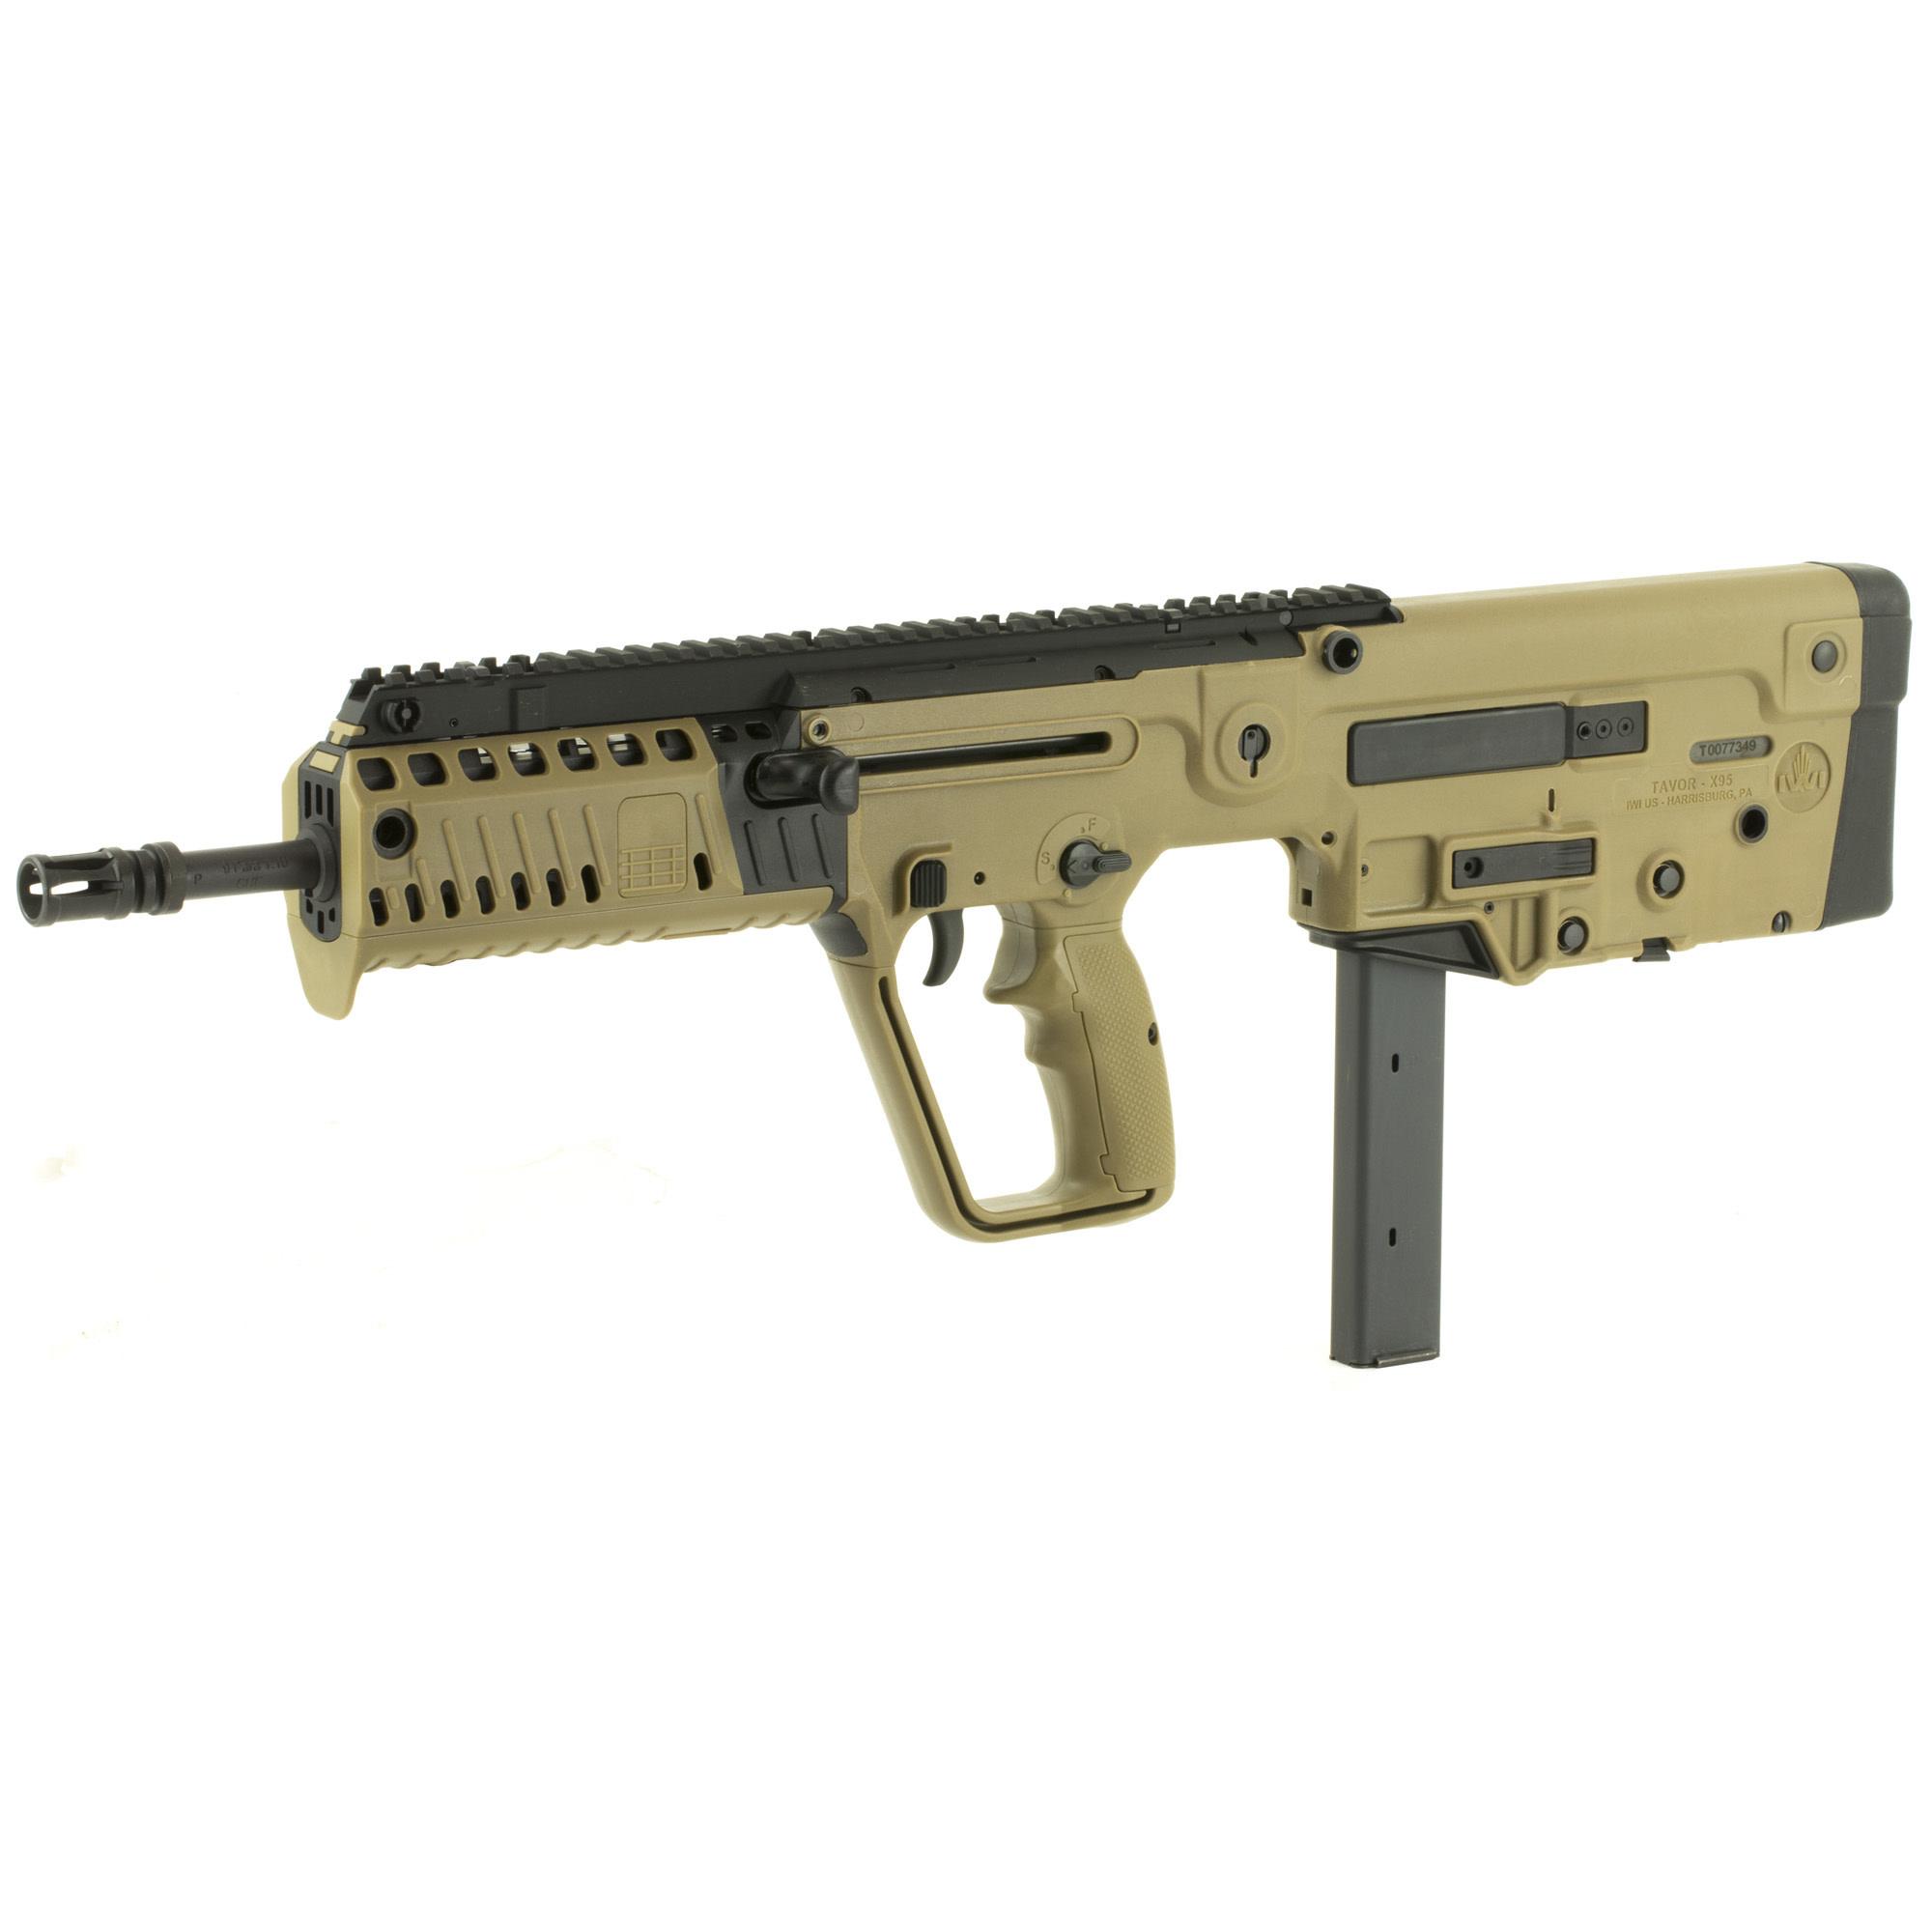 IWI TAVOR X95 bullpup, 9mm, FDE, 32+1, 1 magazine